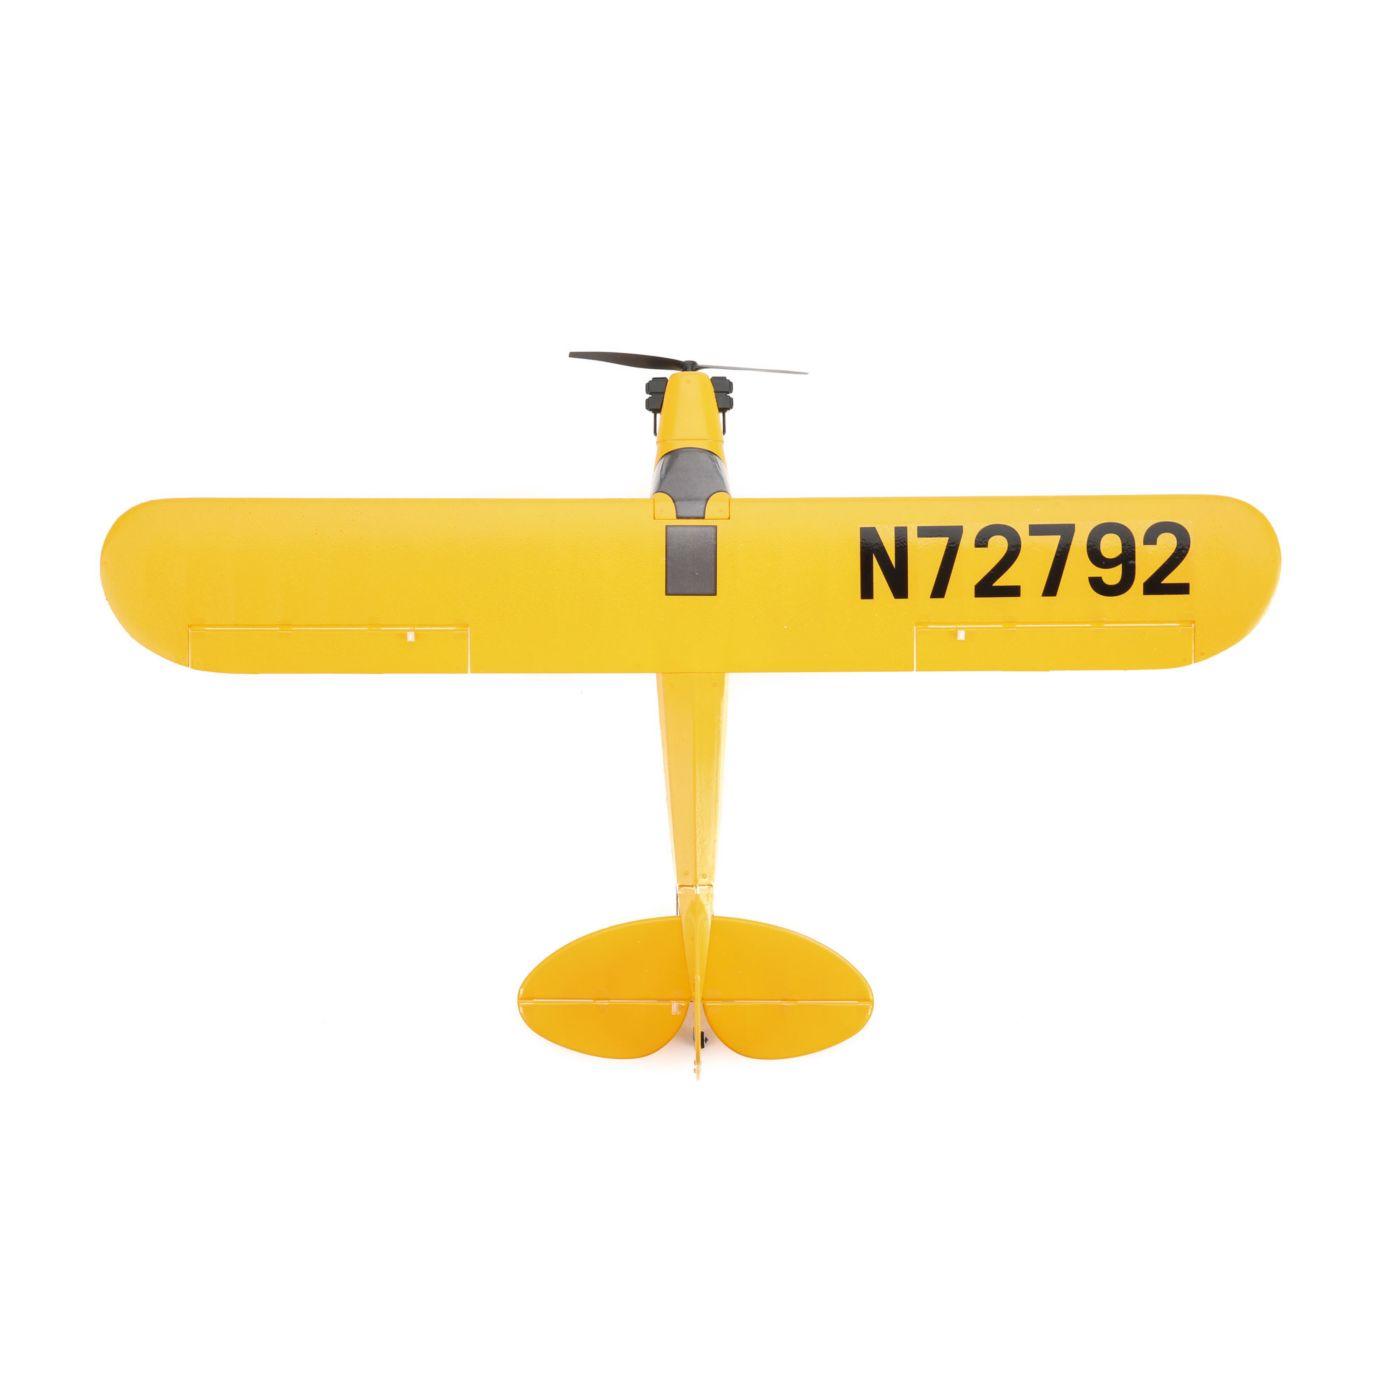 E-flite Wing with Struts UMX J-3 BL EFLU3402